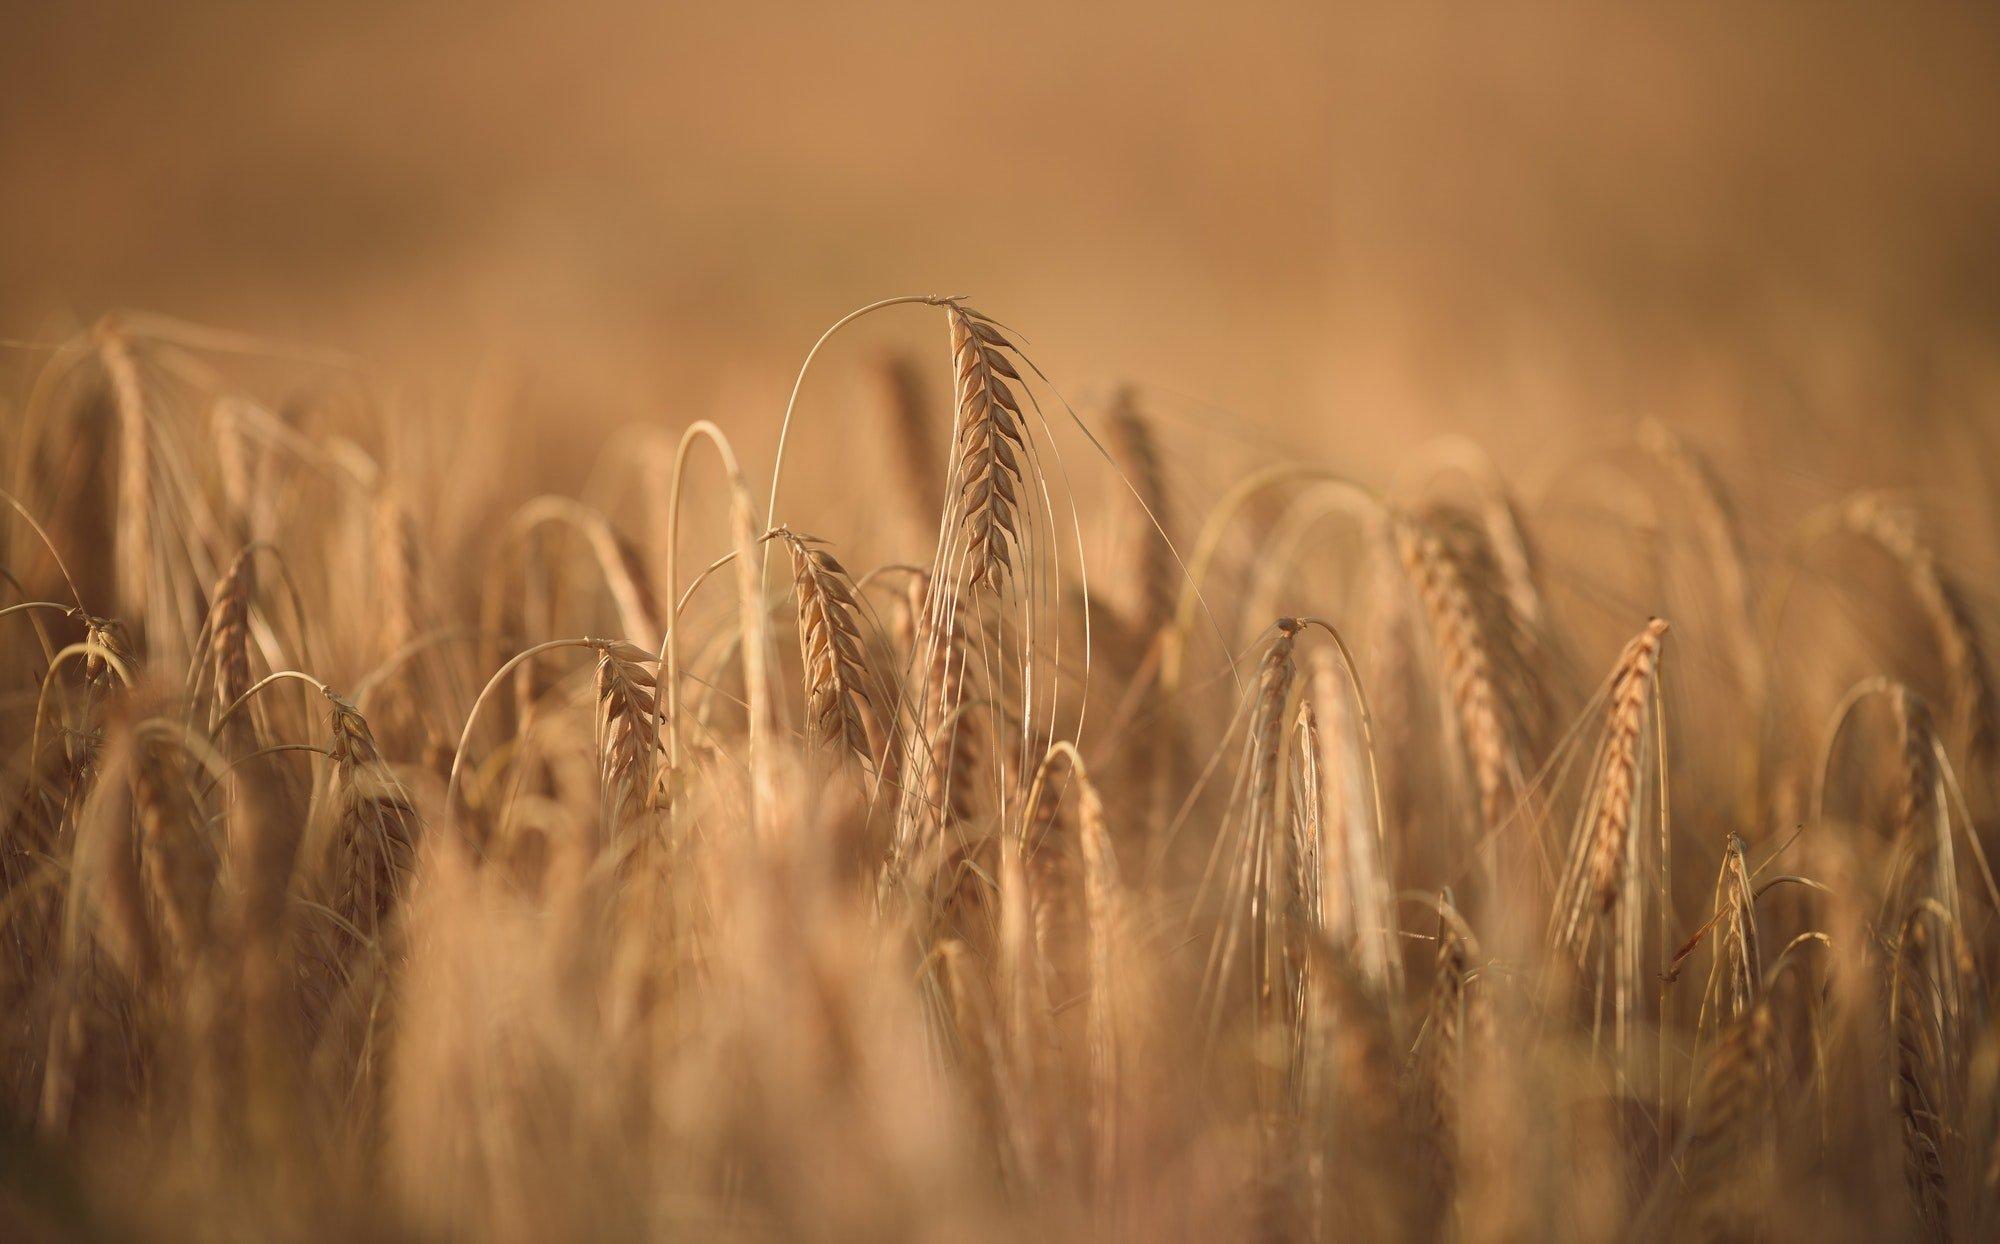 Wheat field background in summer